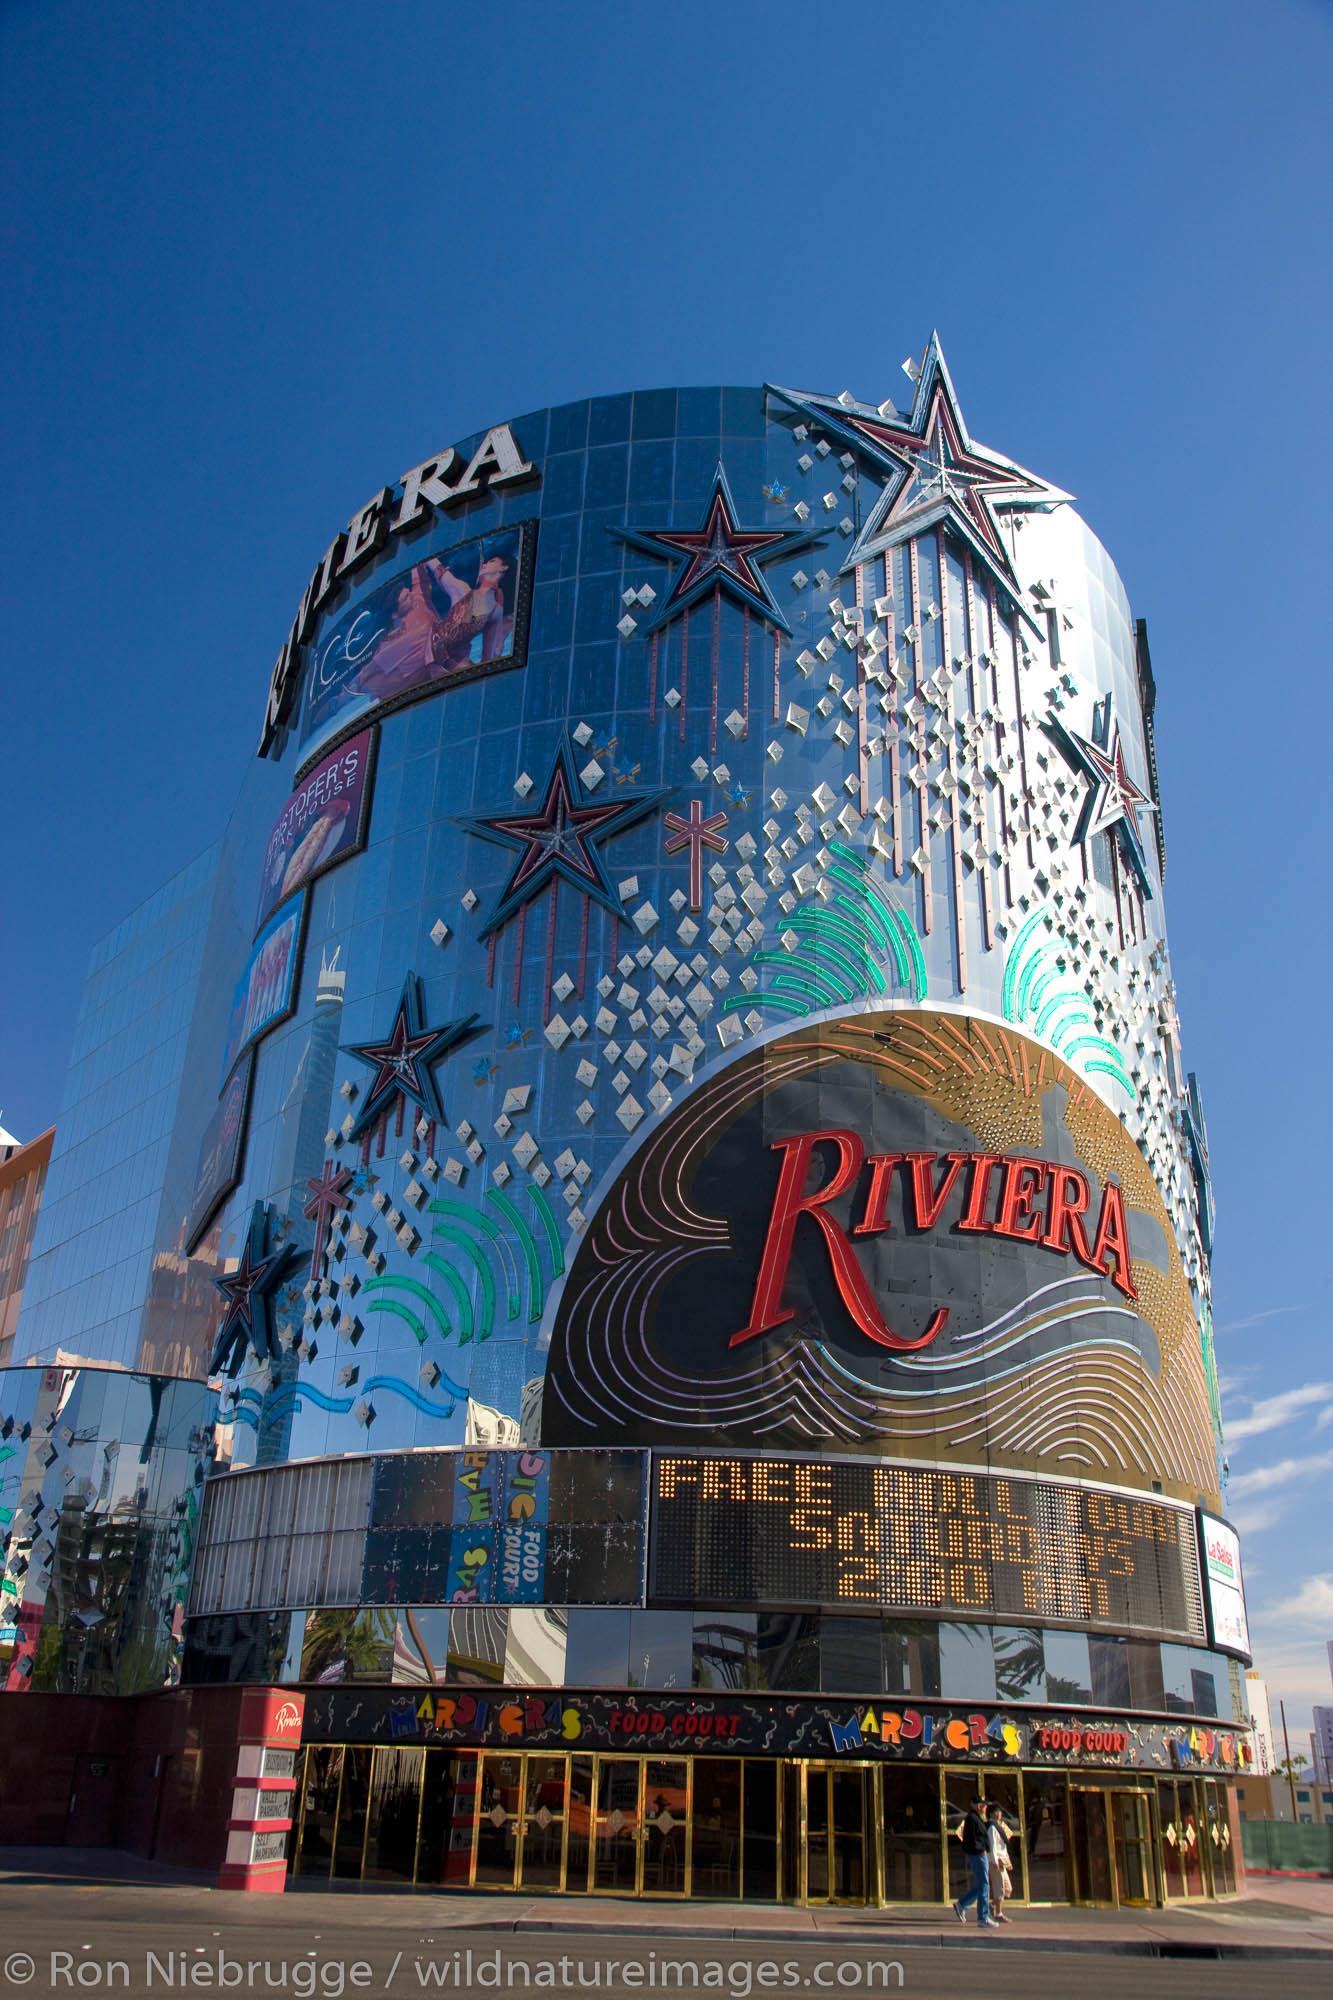 Riviera Hotel and Casino, Las Vegas, Nevada.